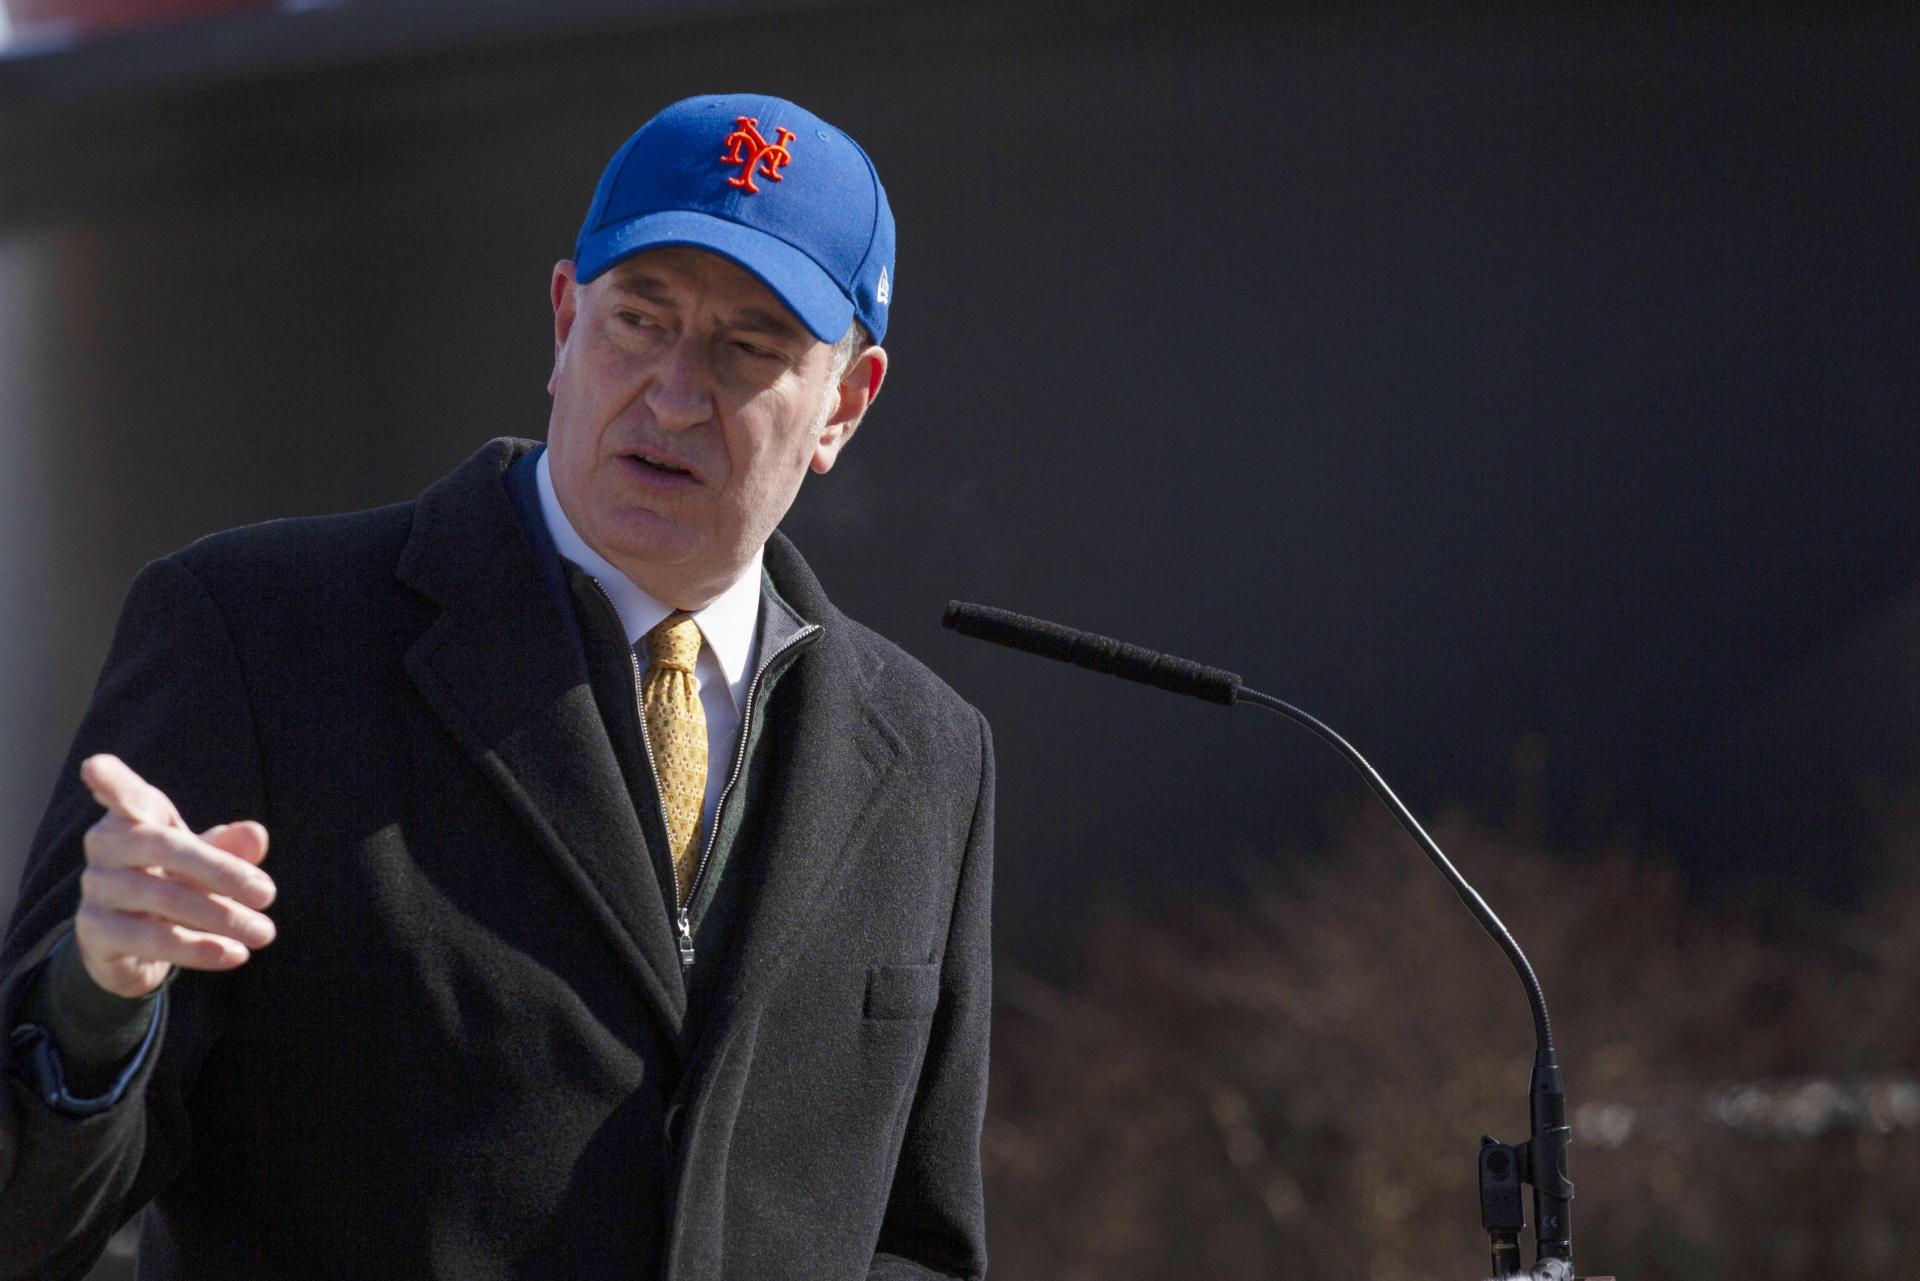 New York major Bill de Blasio. Photo: Kena Betancur/AFP